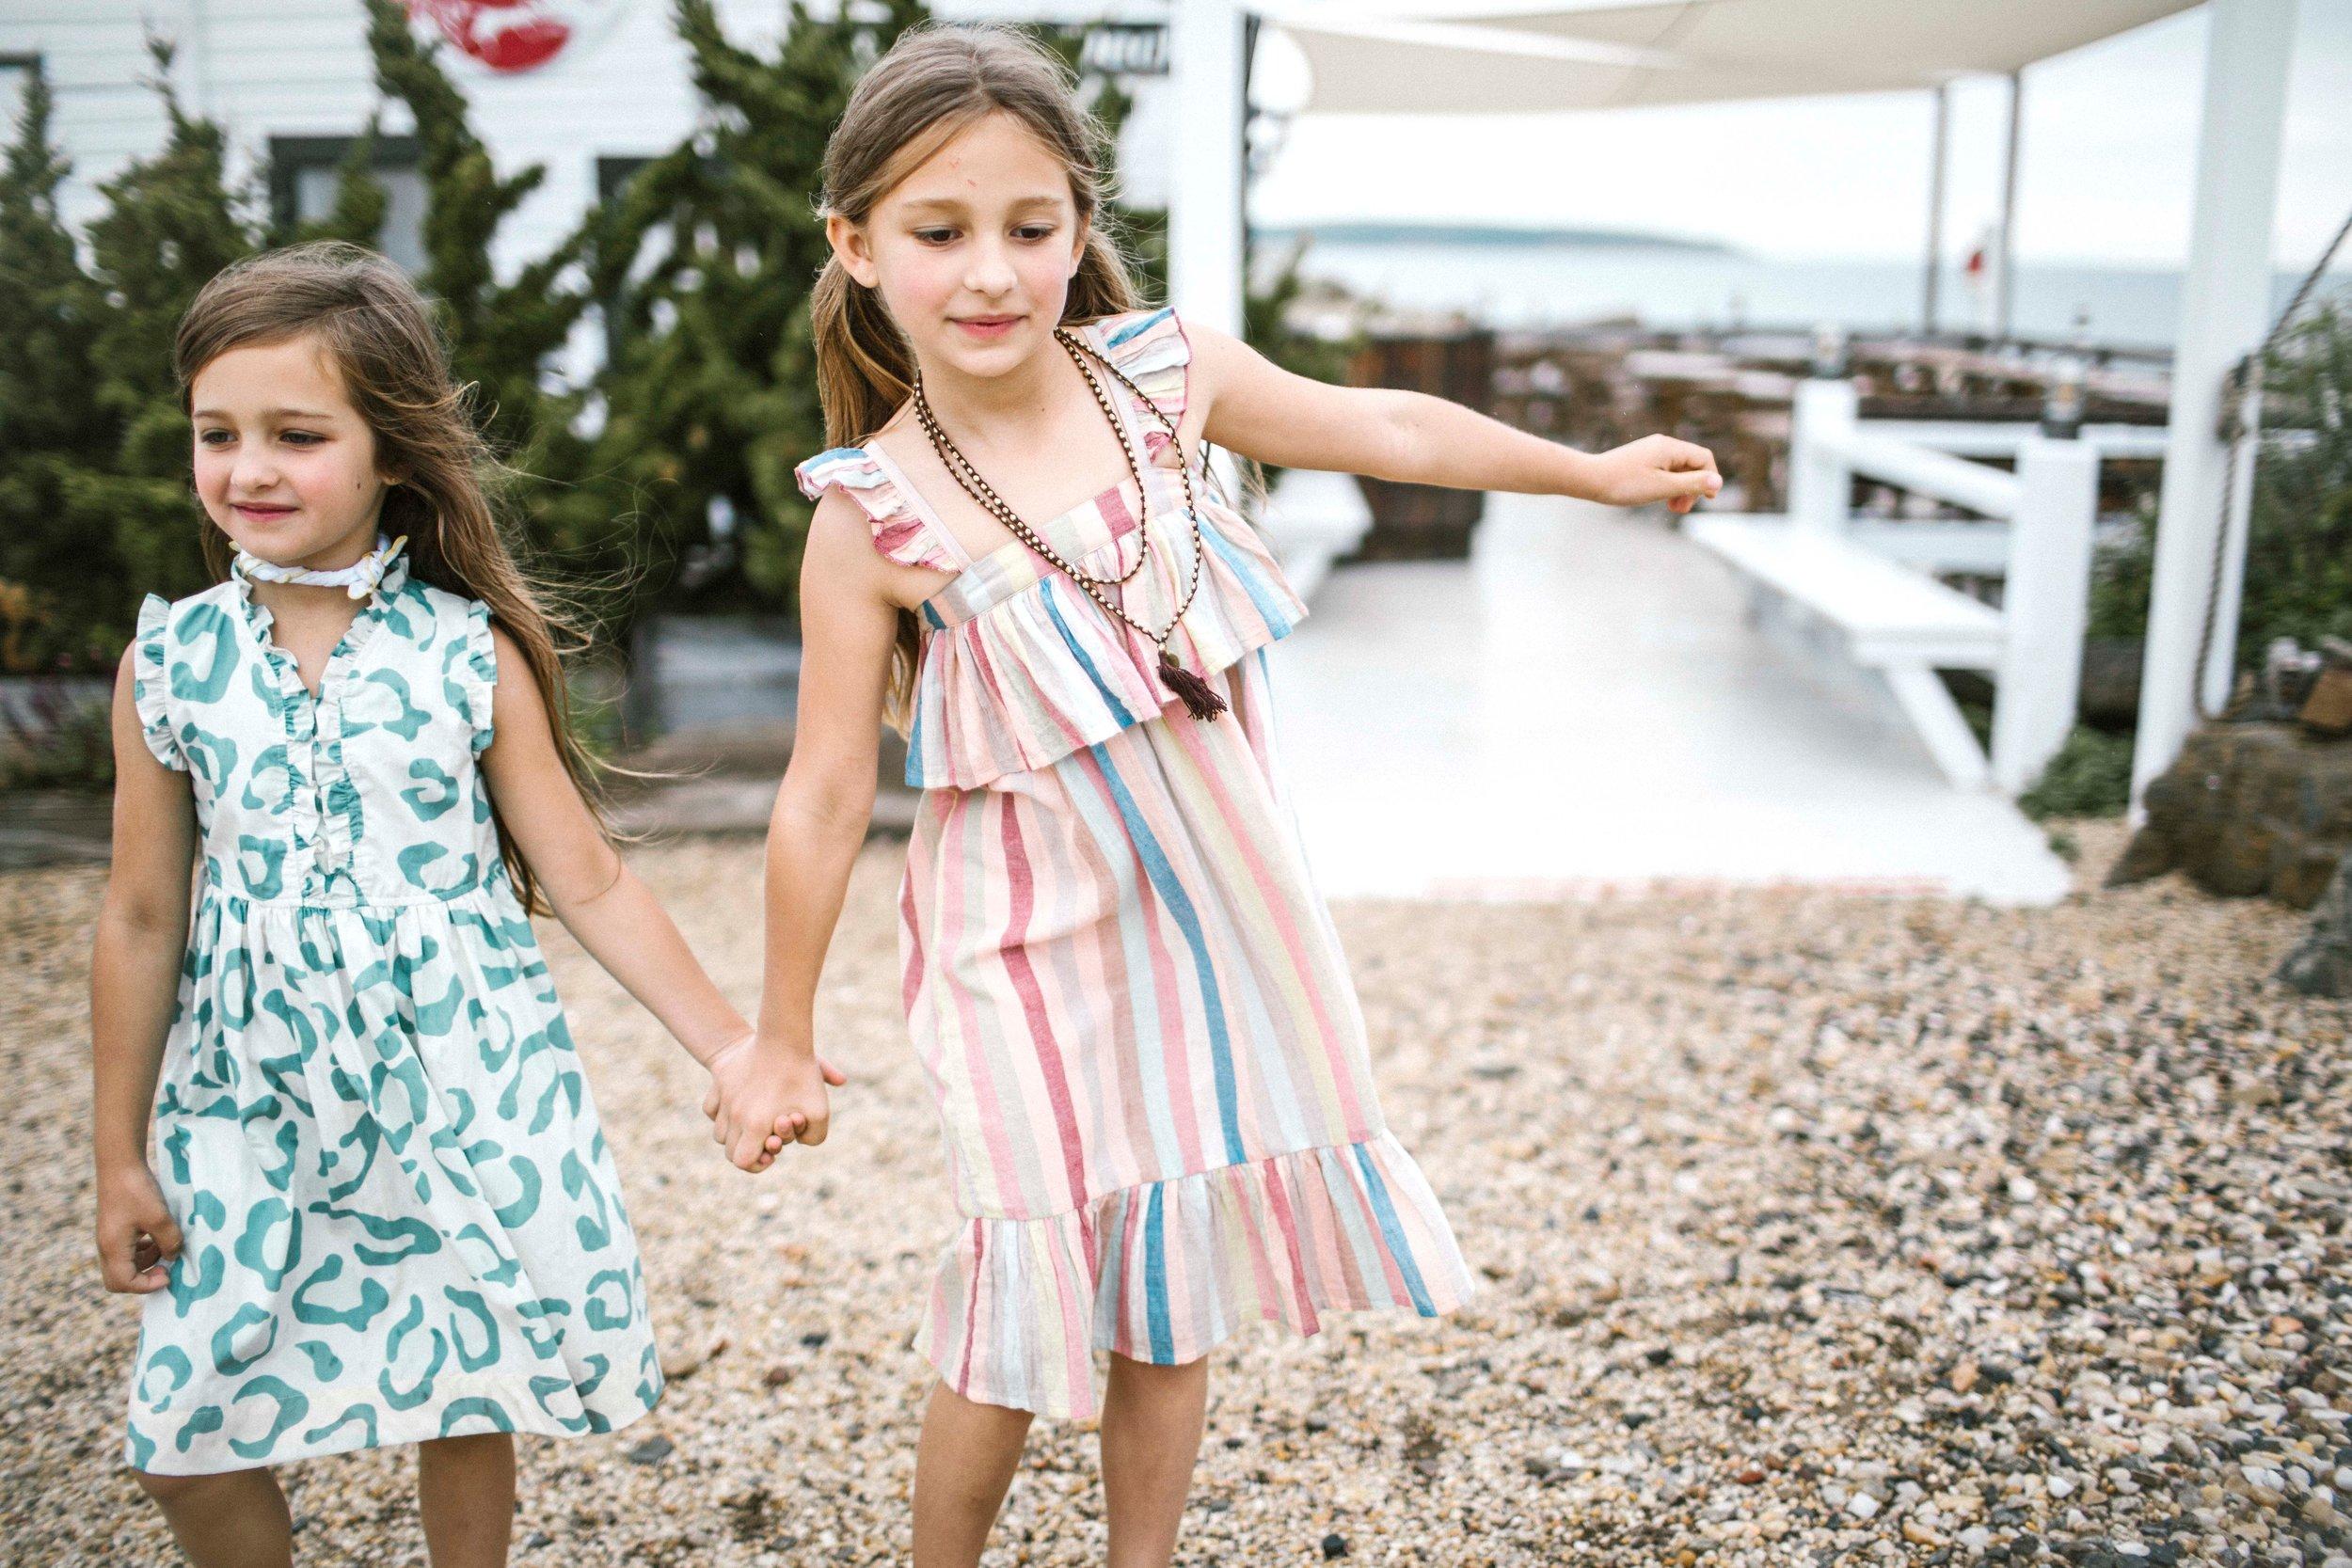 infant girl bathing suits-toddler girl bathing suits-best infant girl clothing-best toddler girl clothing-best price children's clothing-piper jade kids clothing-costa mesa, ca. 92627